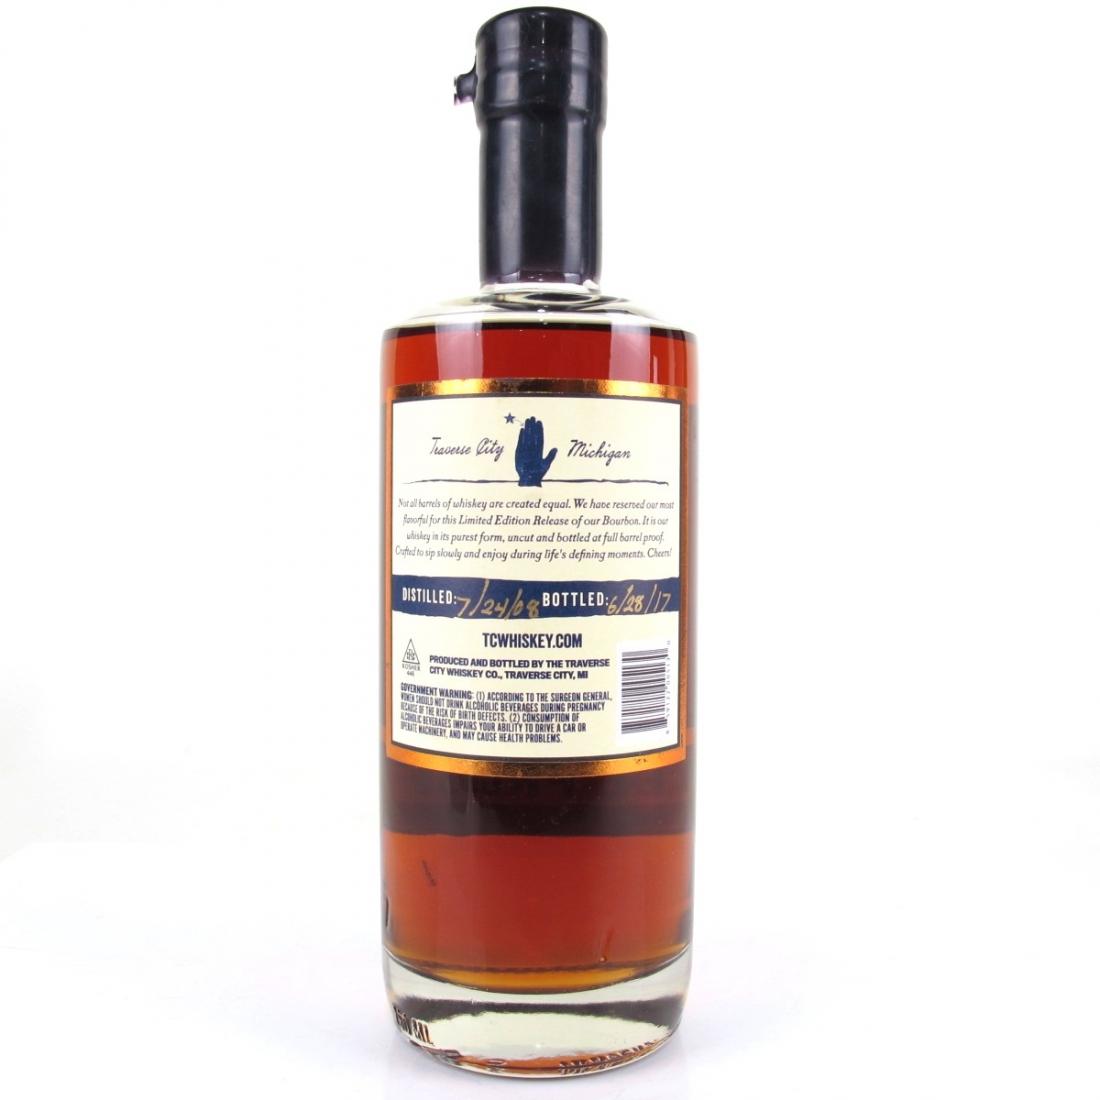 Traverse City Whisky Co. 2008 Straight Bourbon / Binny's